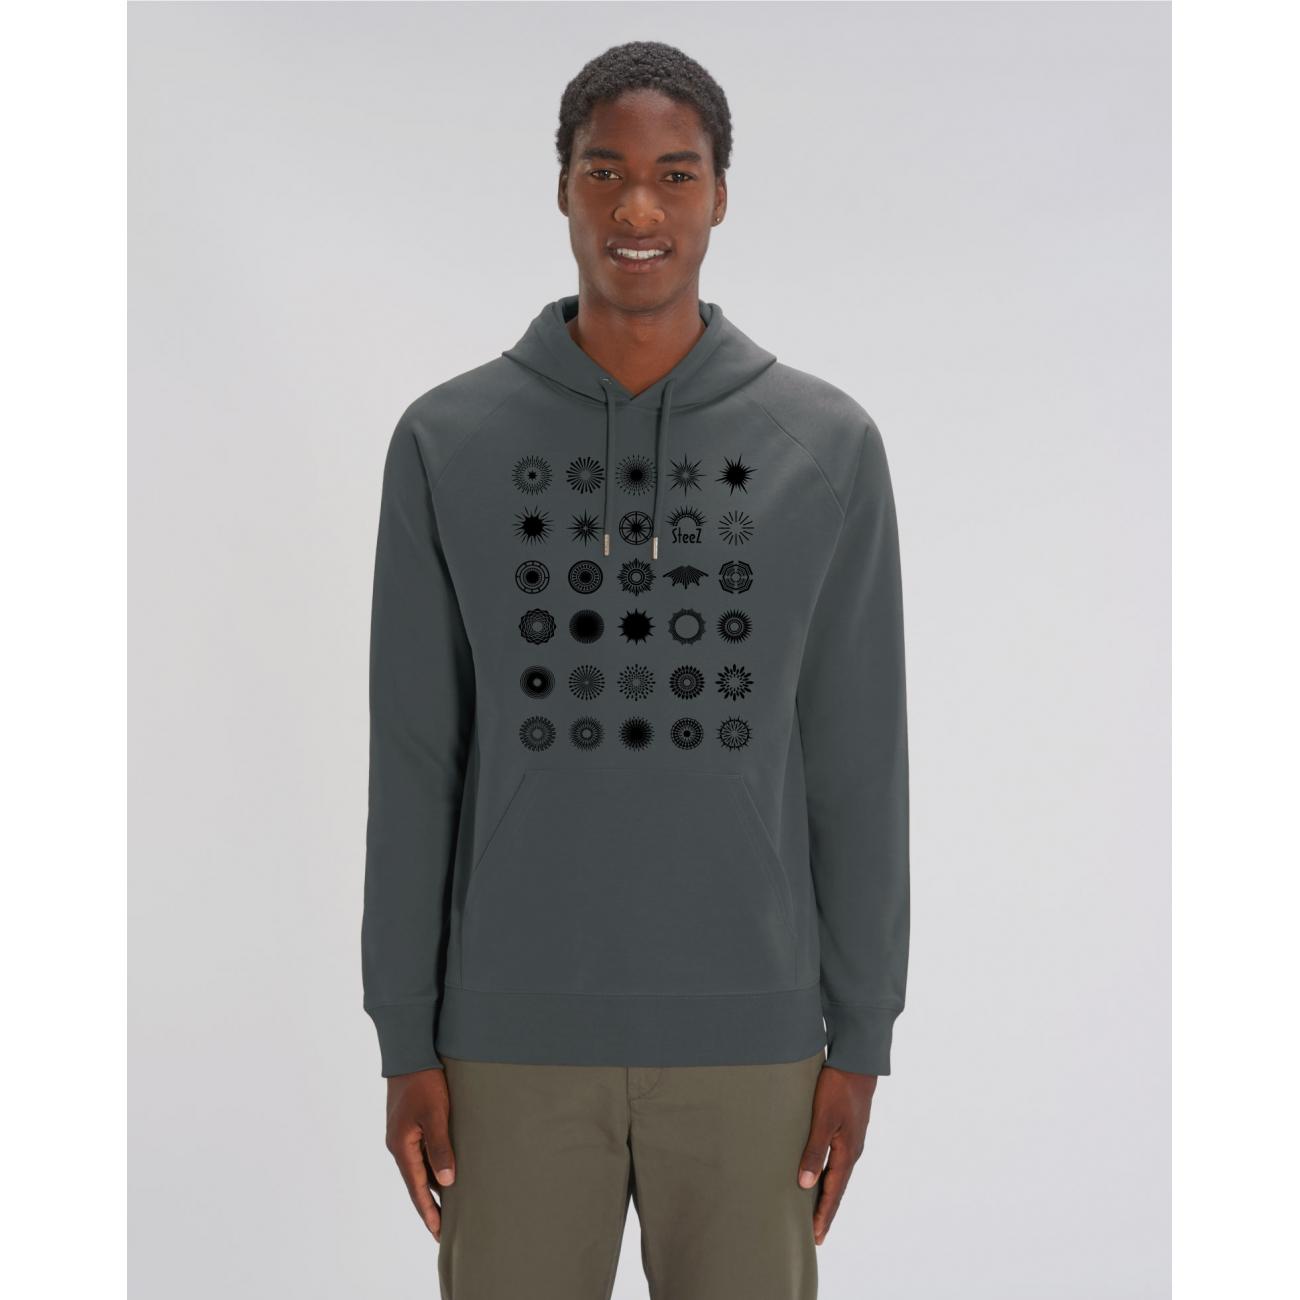 https://tee-shirt-bio.com/7711-thickbox_default/sweat-shirt-homme-a-capuche-anthracite-coton-bio-etoiles-noires-flyers.jpg